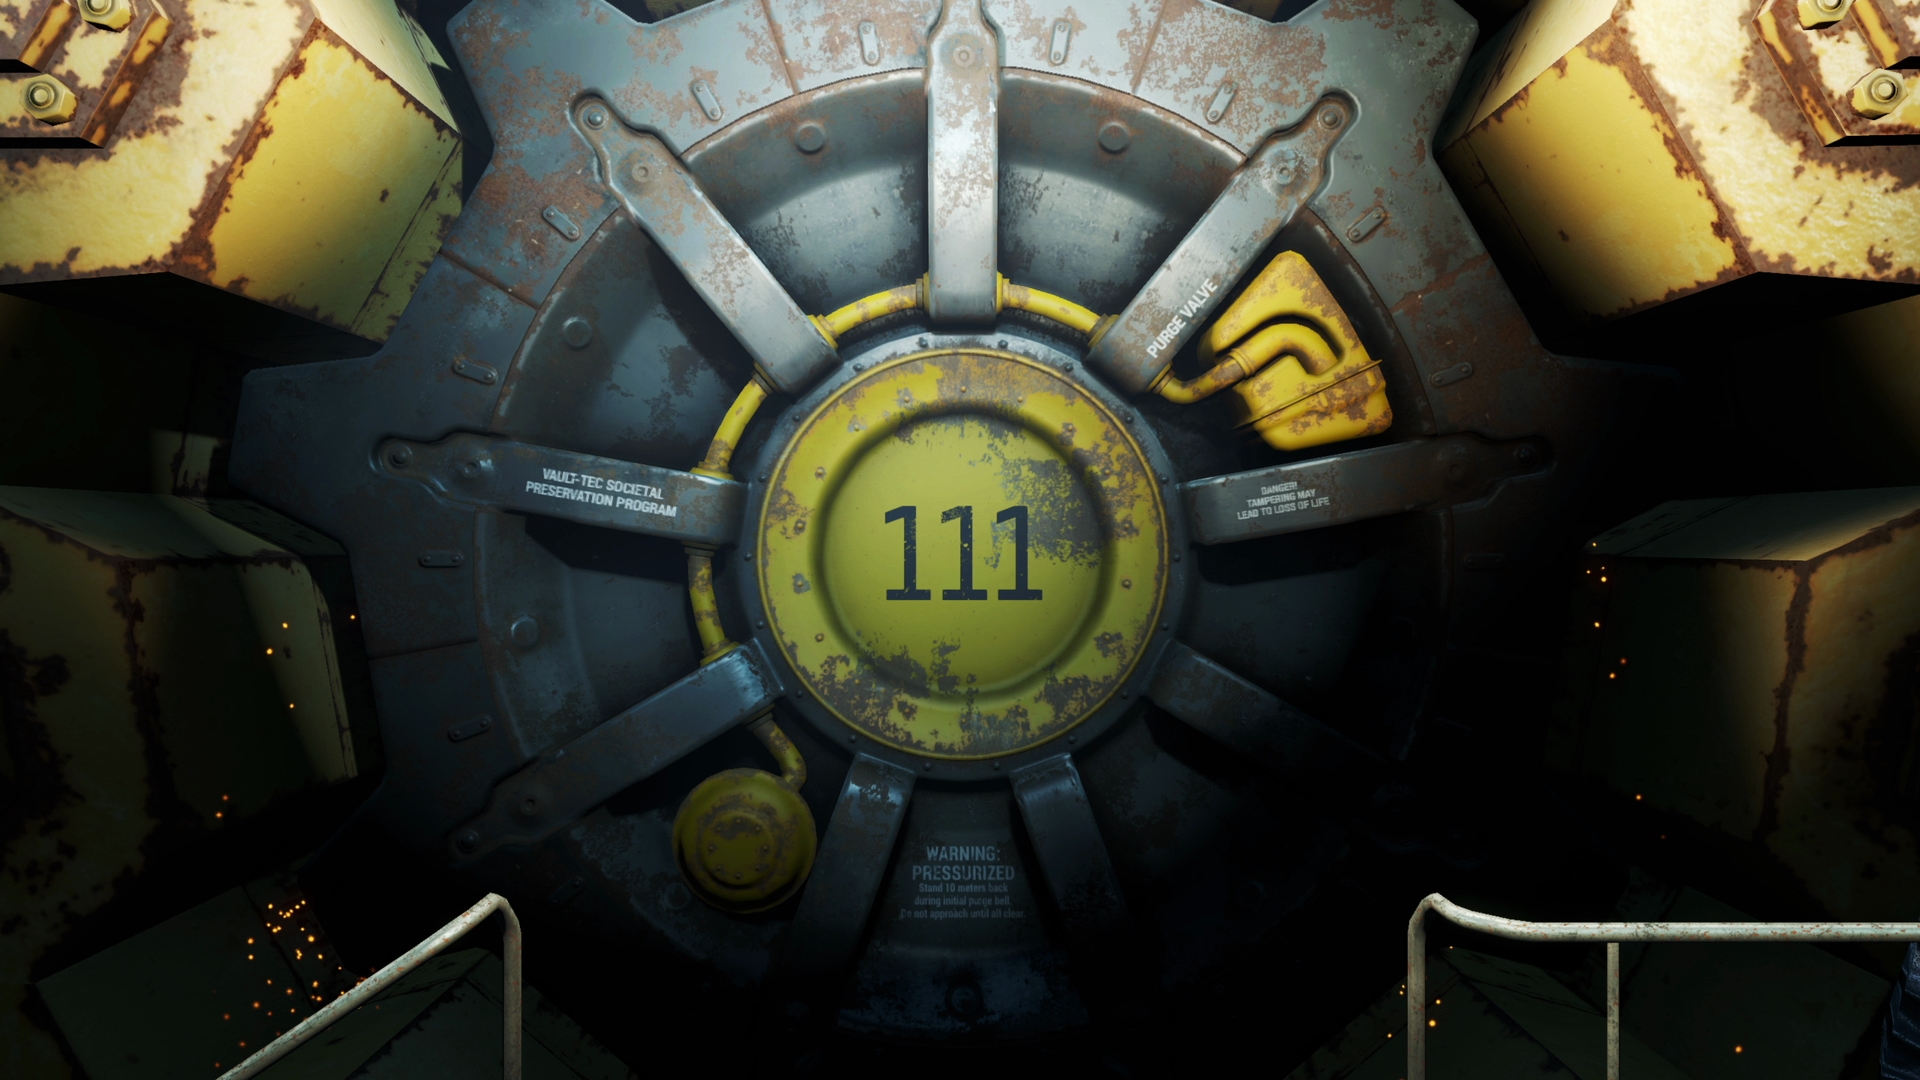 Fallout 4 Clipart 1920x1080 Hd.